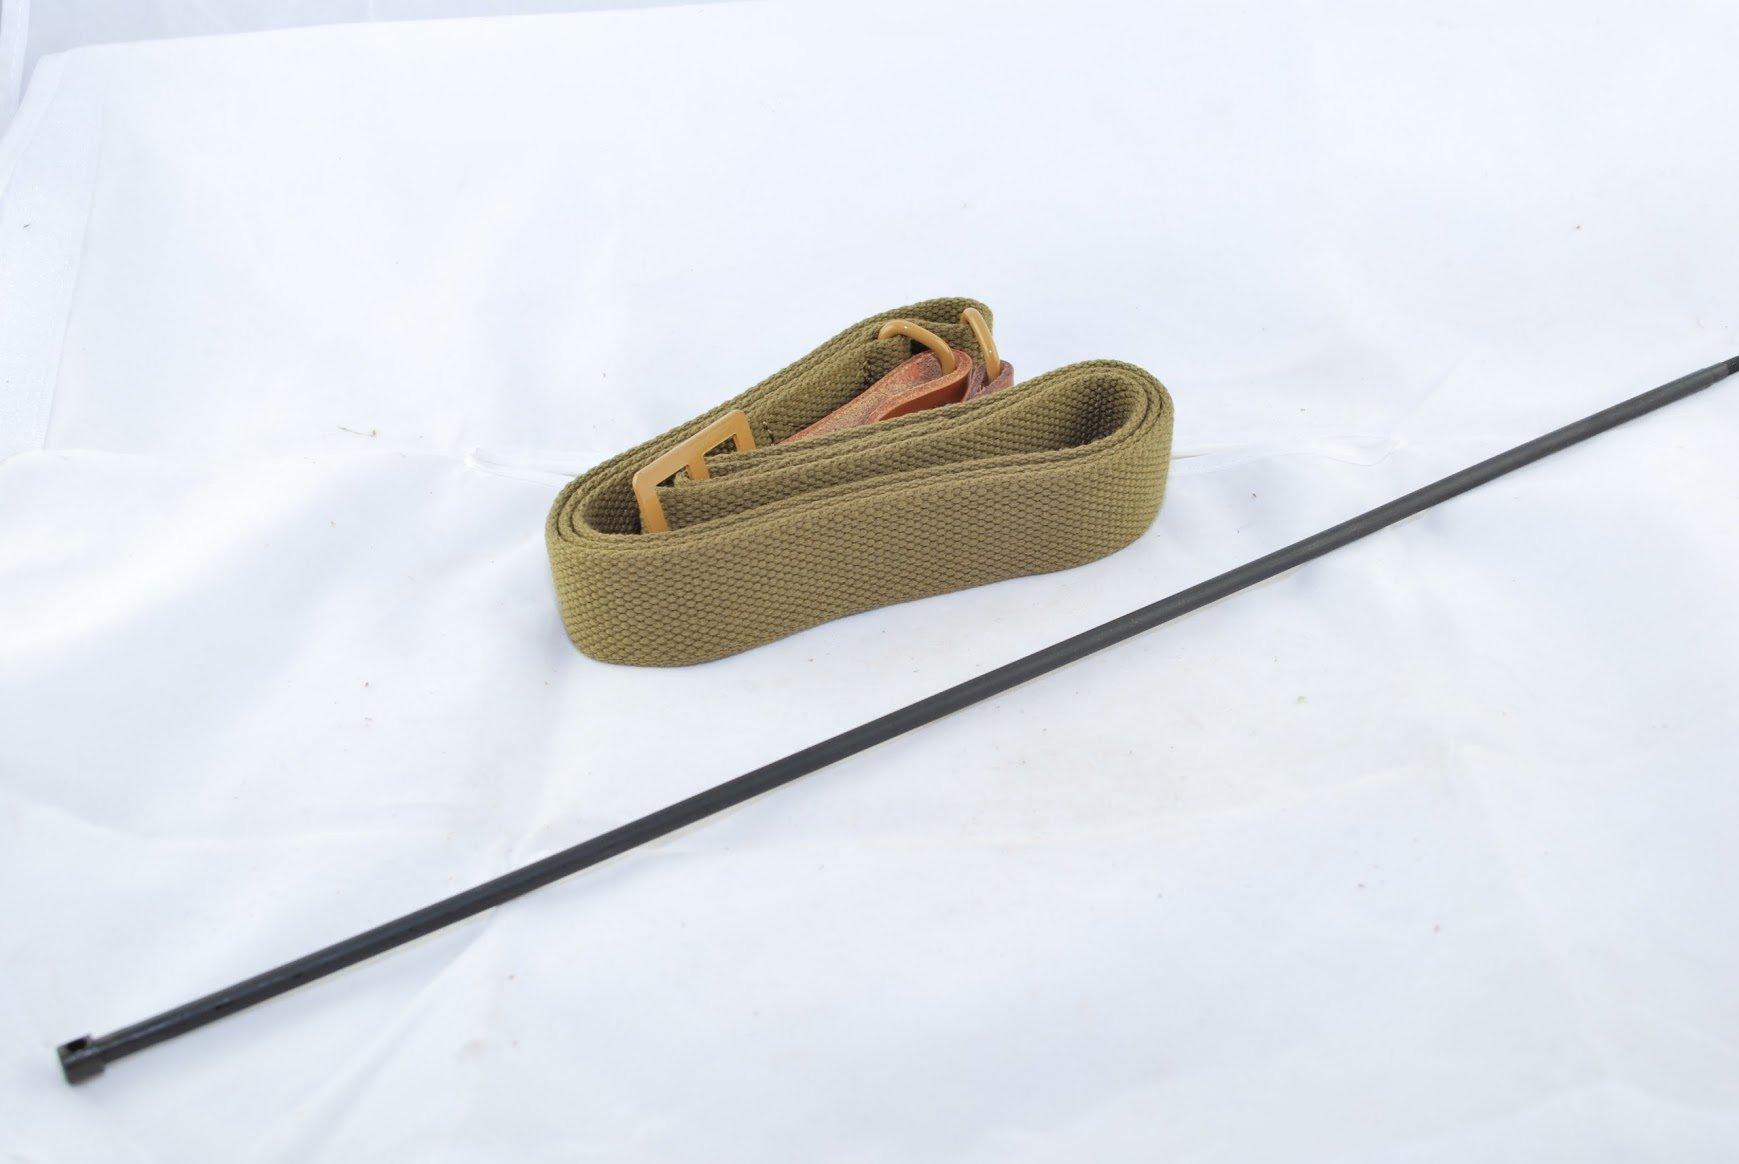 Tacbro - Ak/sks Sling (Heavy Duty), Medium, Tan and Ak Cleaning Rod By Tacbro